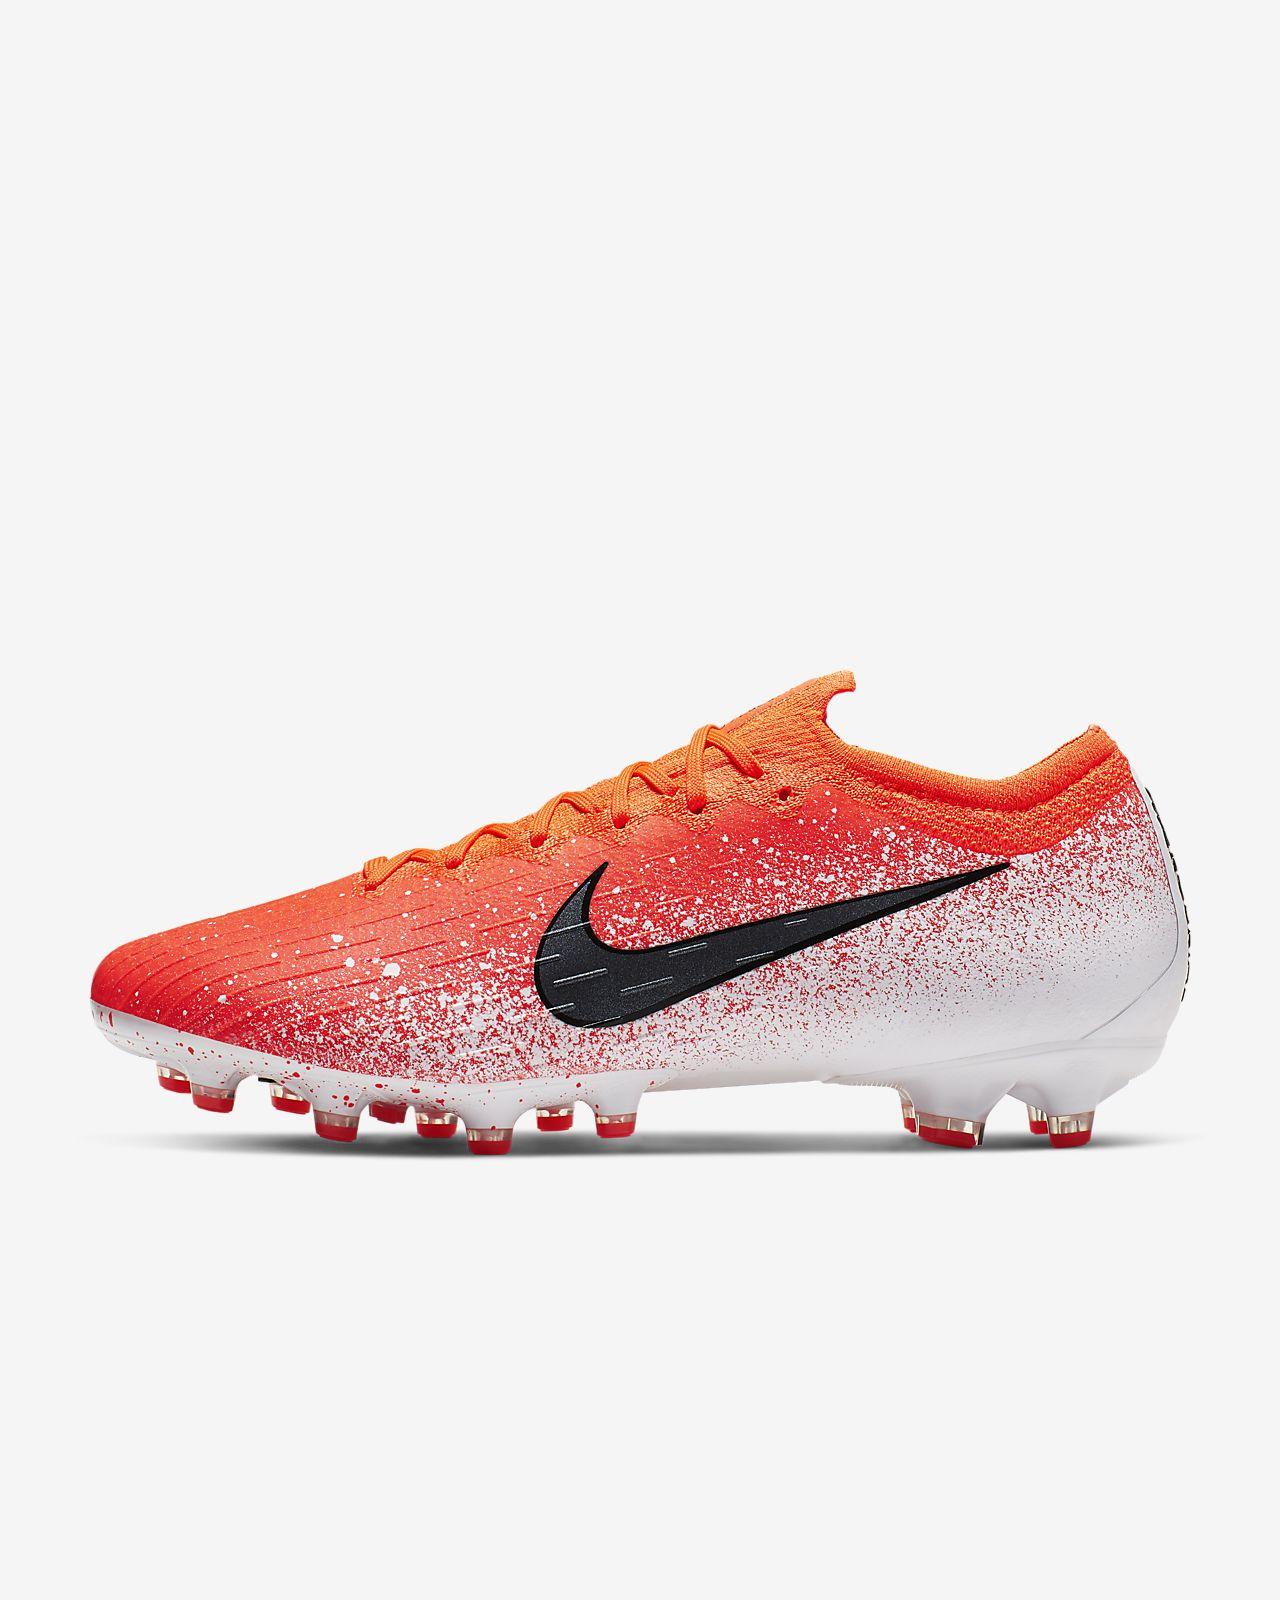 Kopačka na umělou trávu Nike Mercurial Vapor 360 Elite AG-PRO